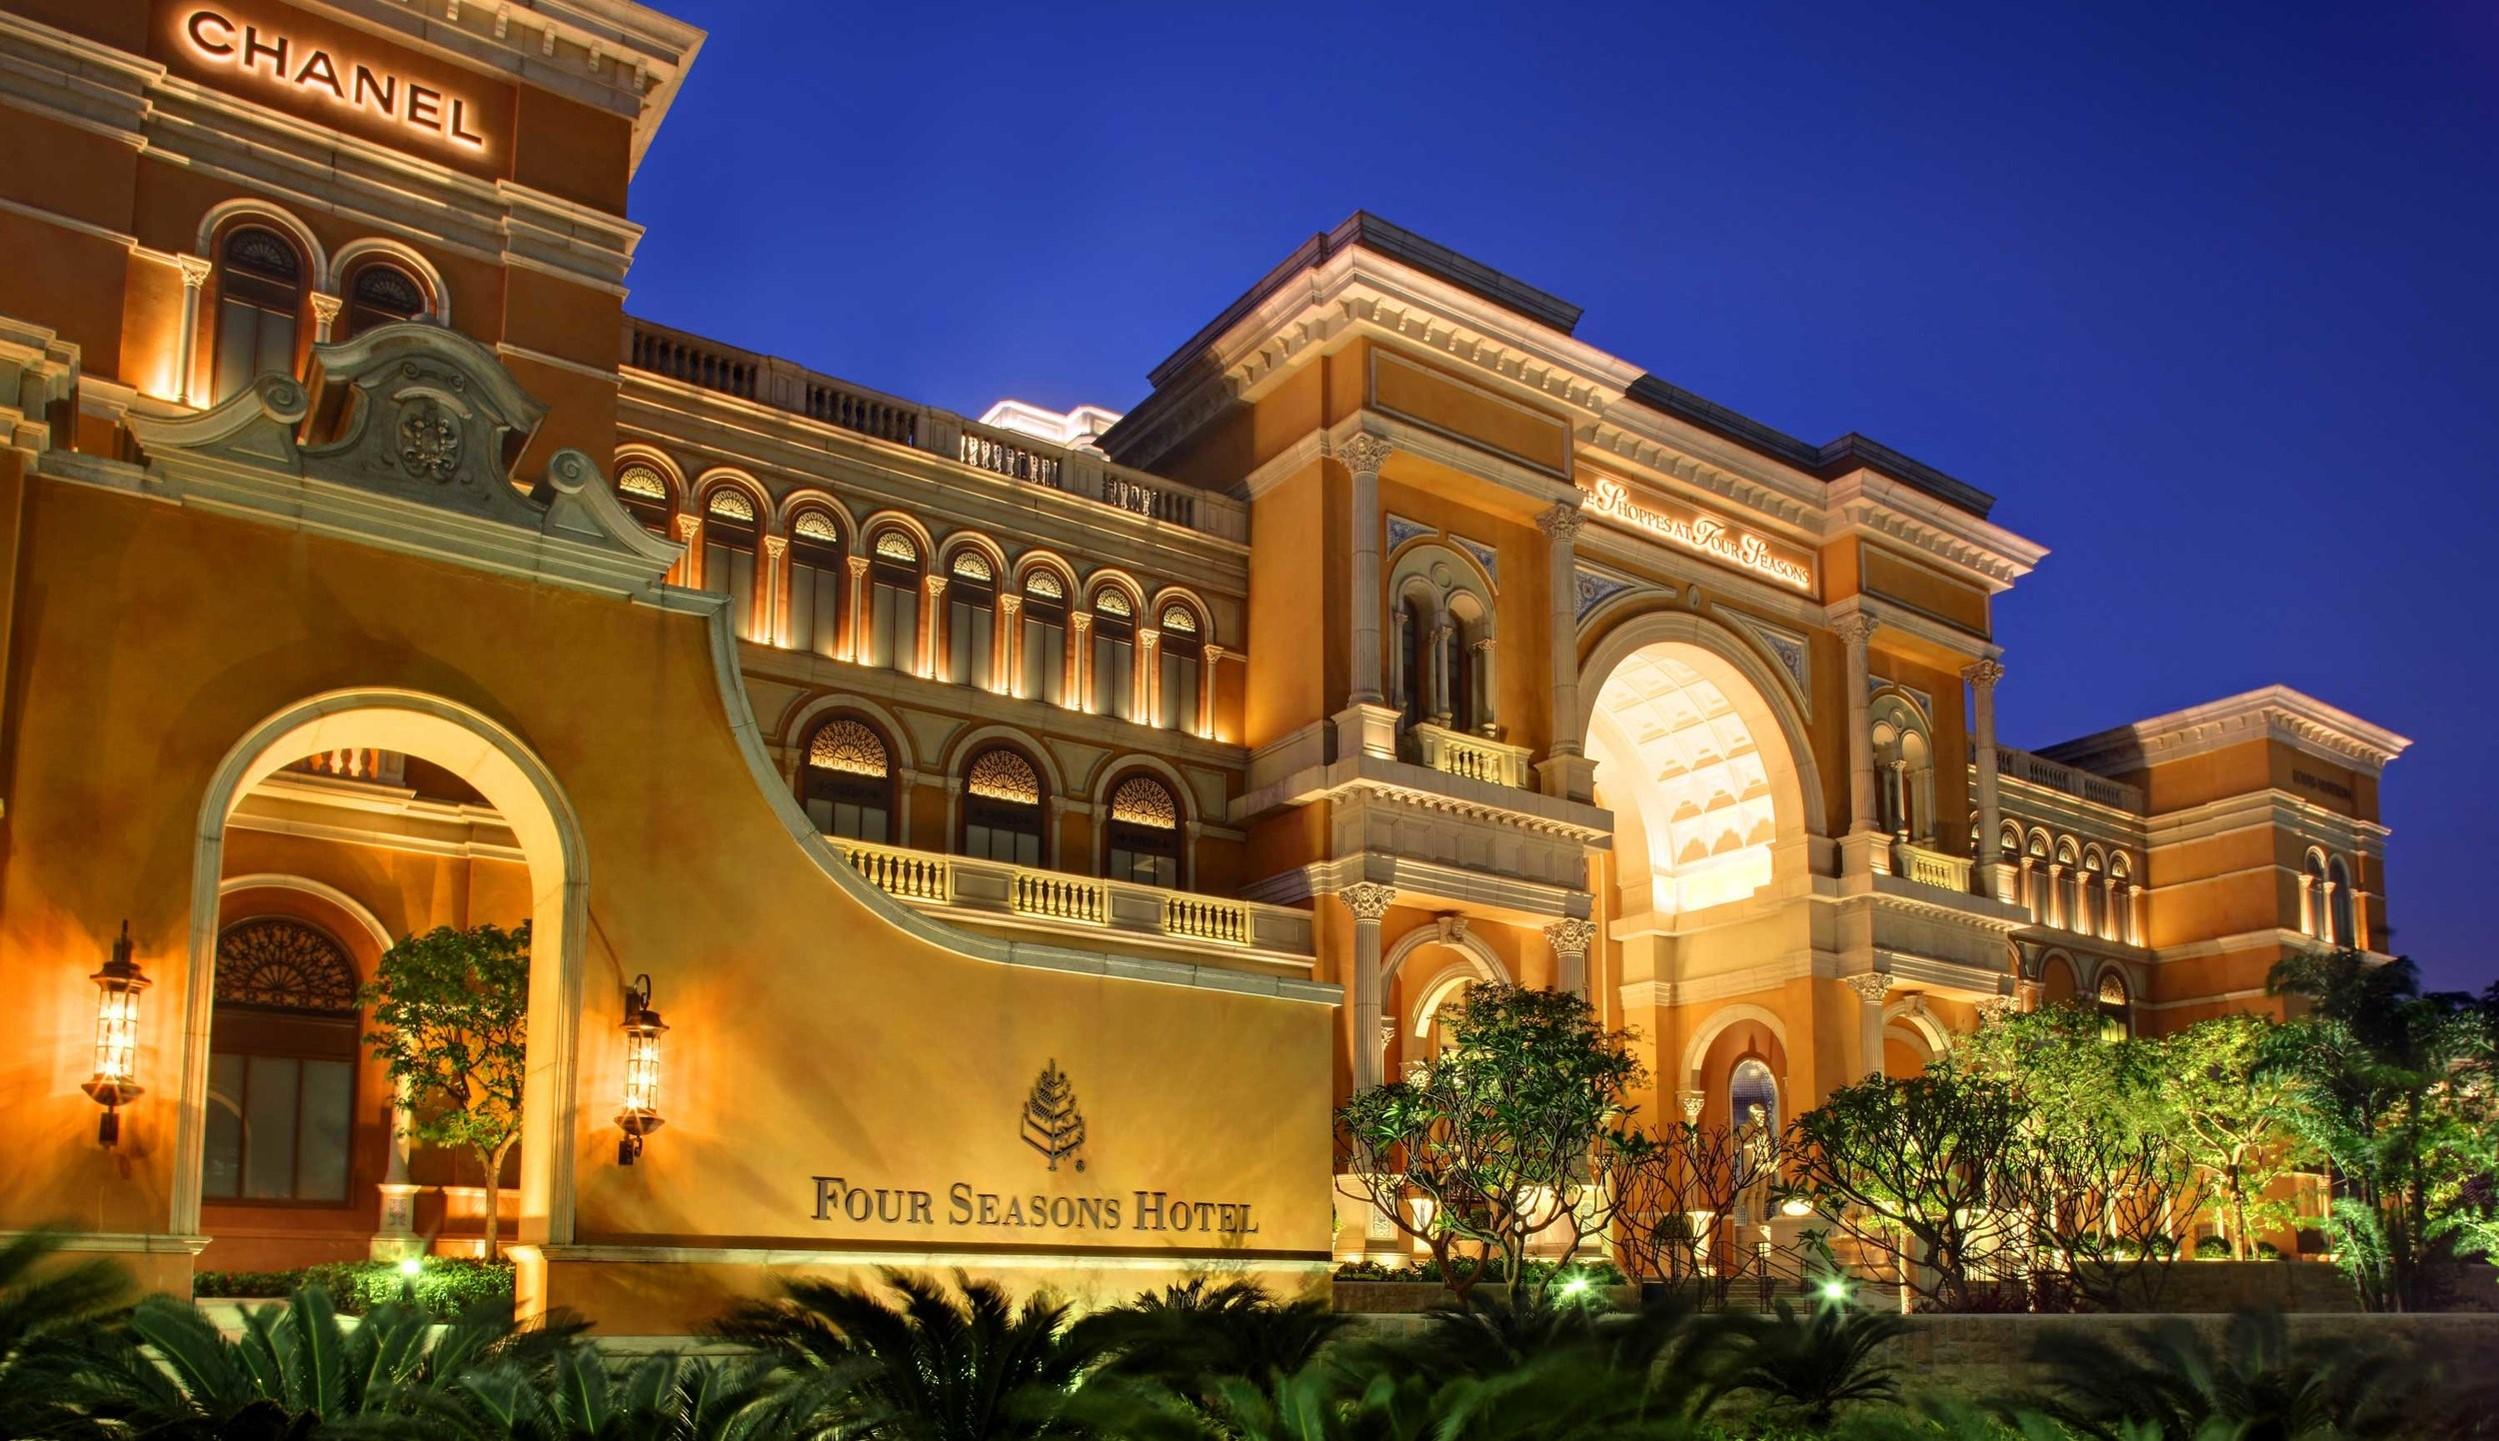 Four Seasons Resort, Macau